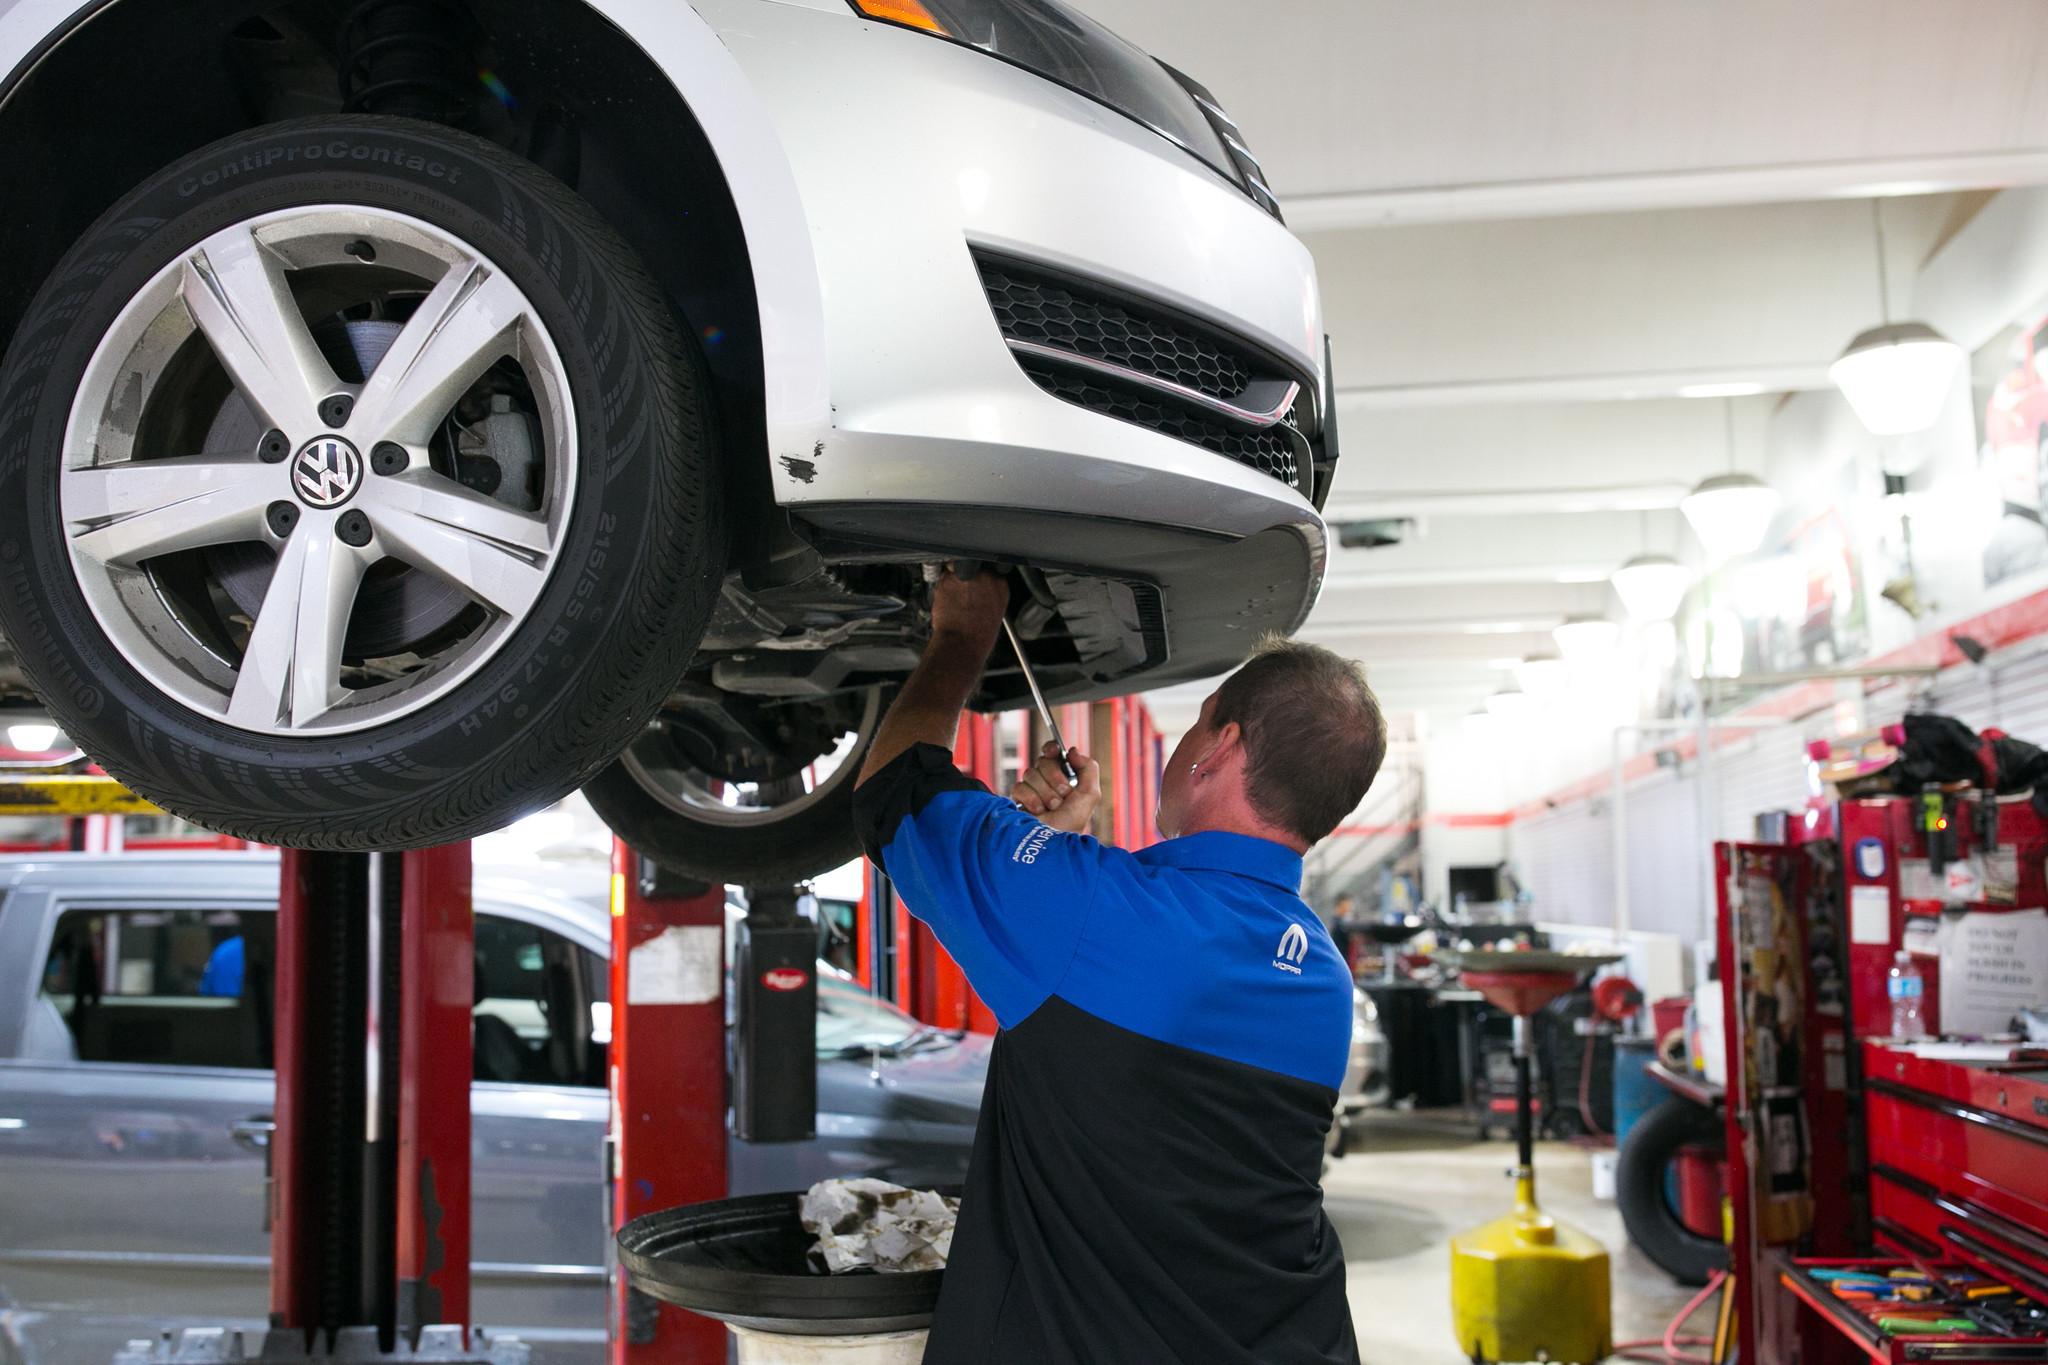 Car Dealerships In Ct >> Dealership group accuses striking mechanics of labor law violation - Chicago Tribune